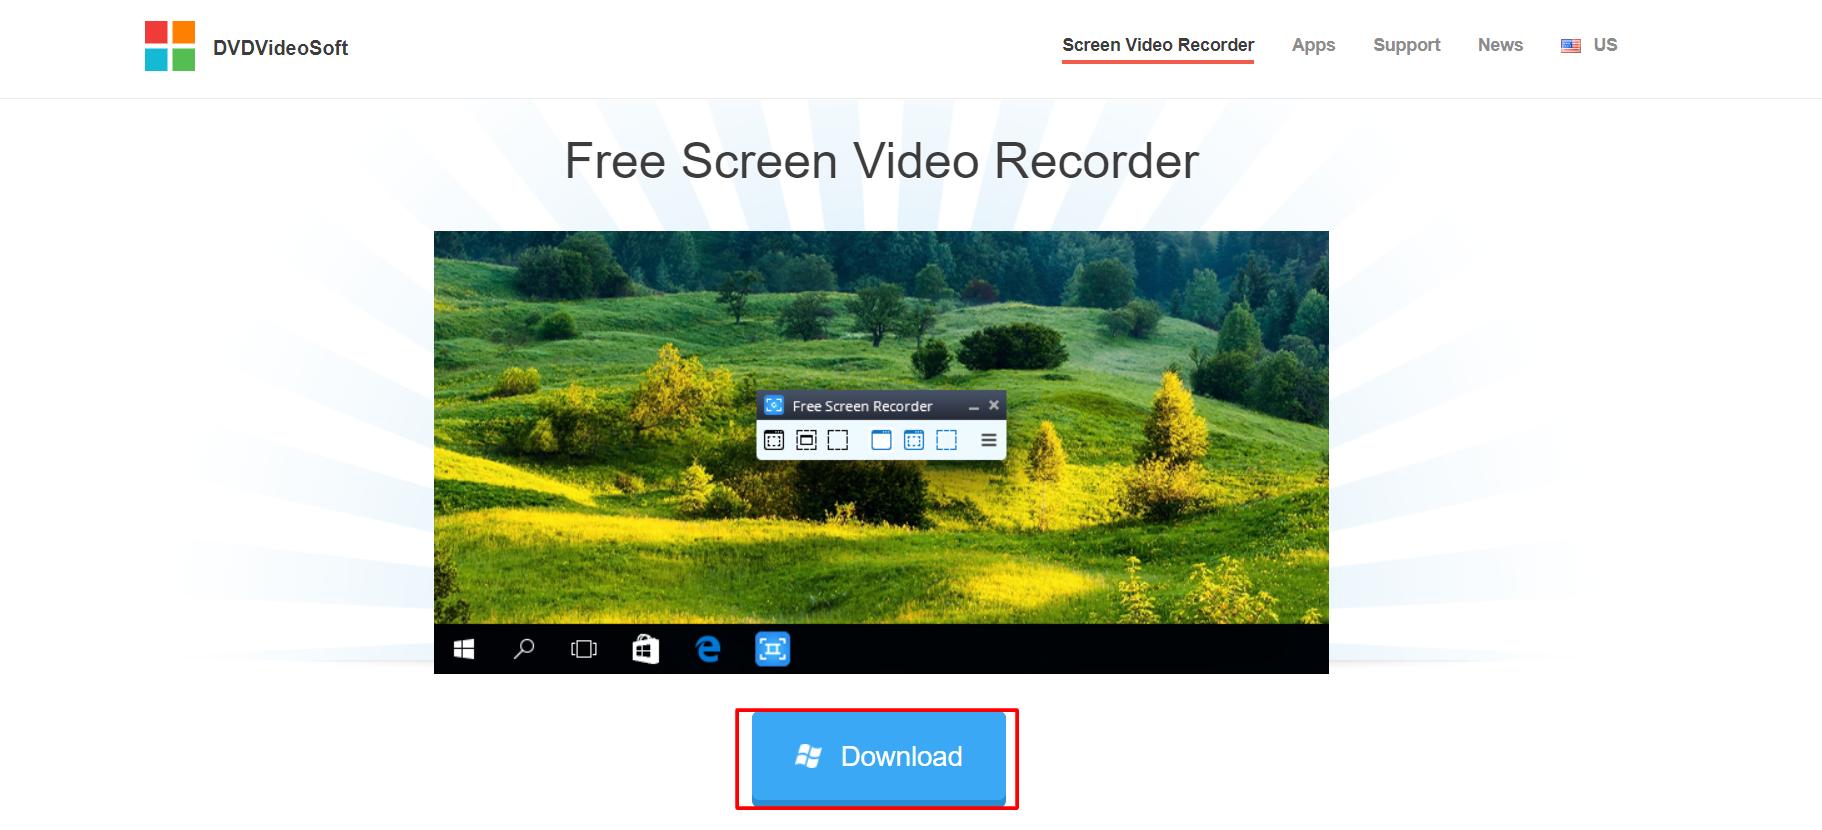 Free Screen Video Recorder bu DVDVideoSoft